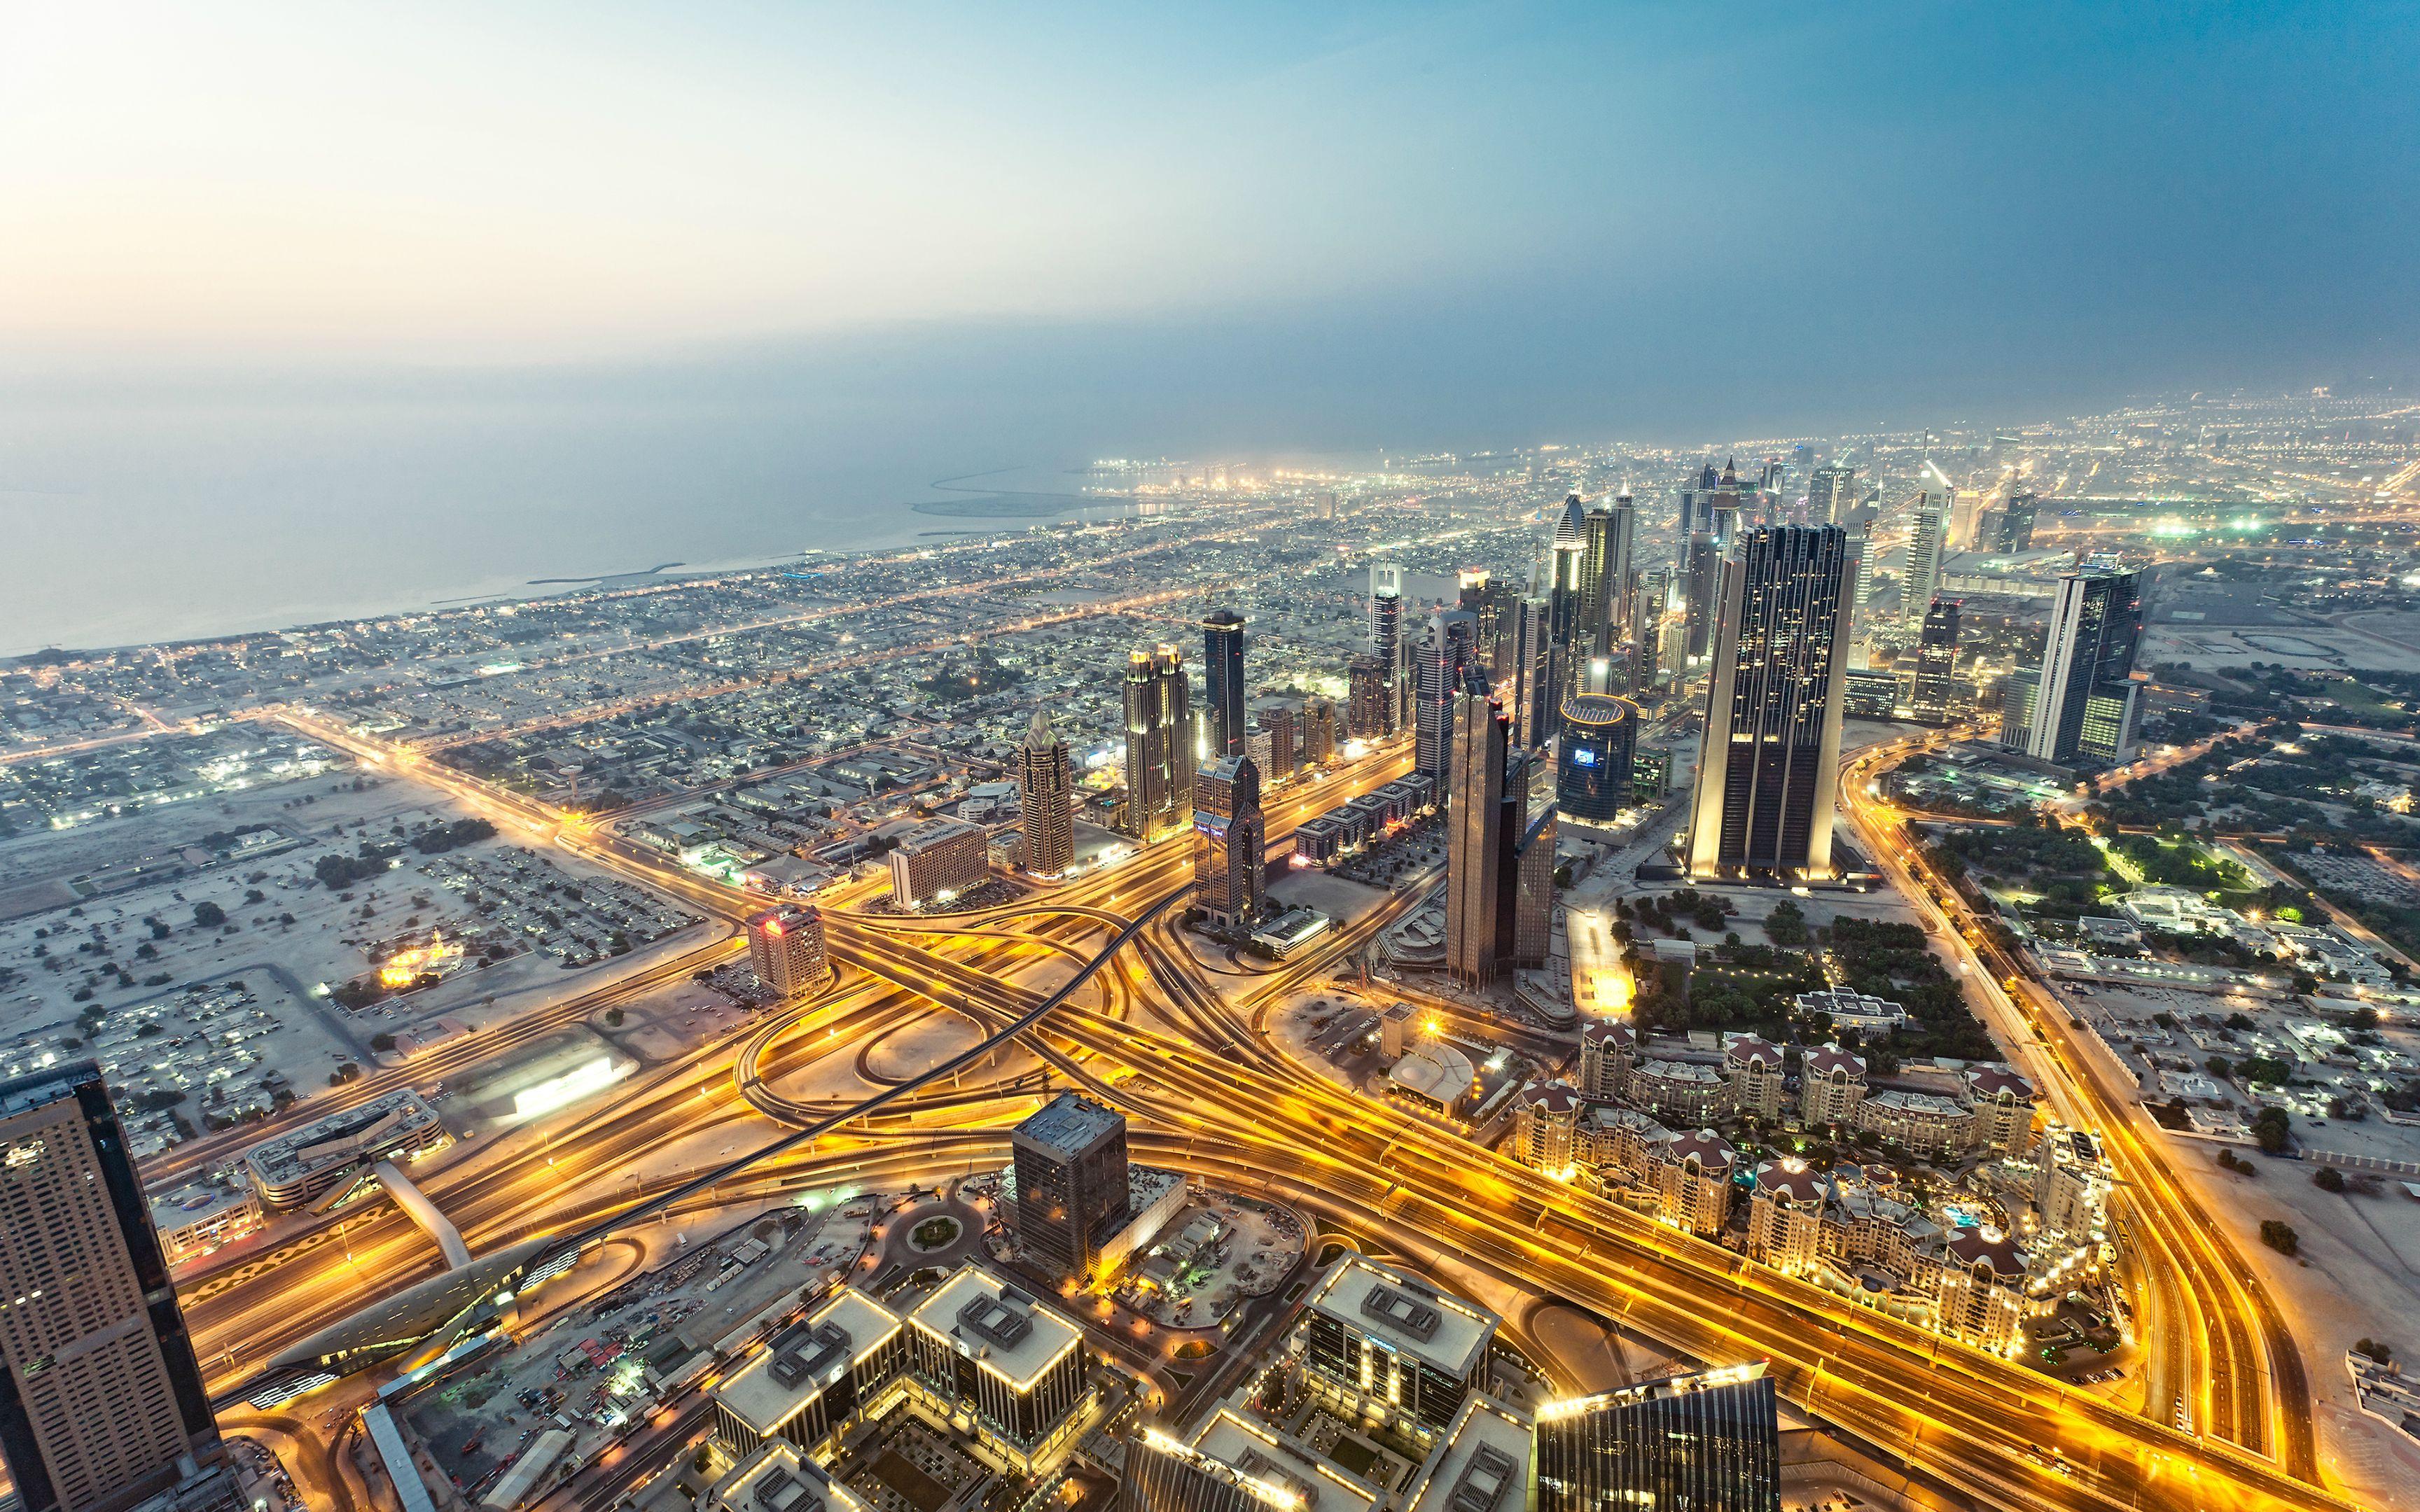 Dubai 4k Wallpapers For Your Desktop Or Mobile Screen Free